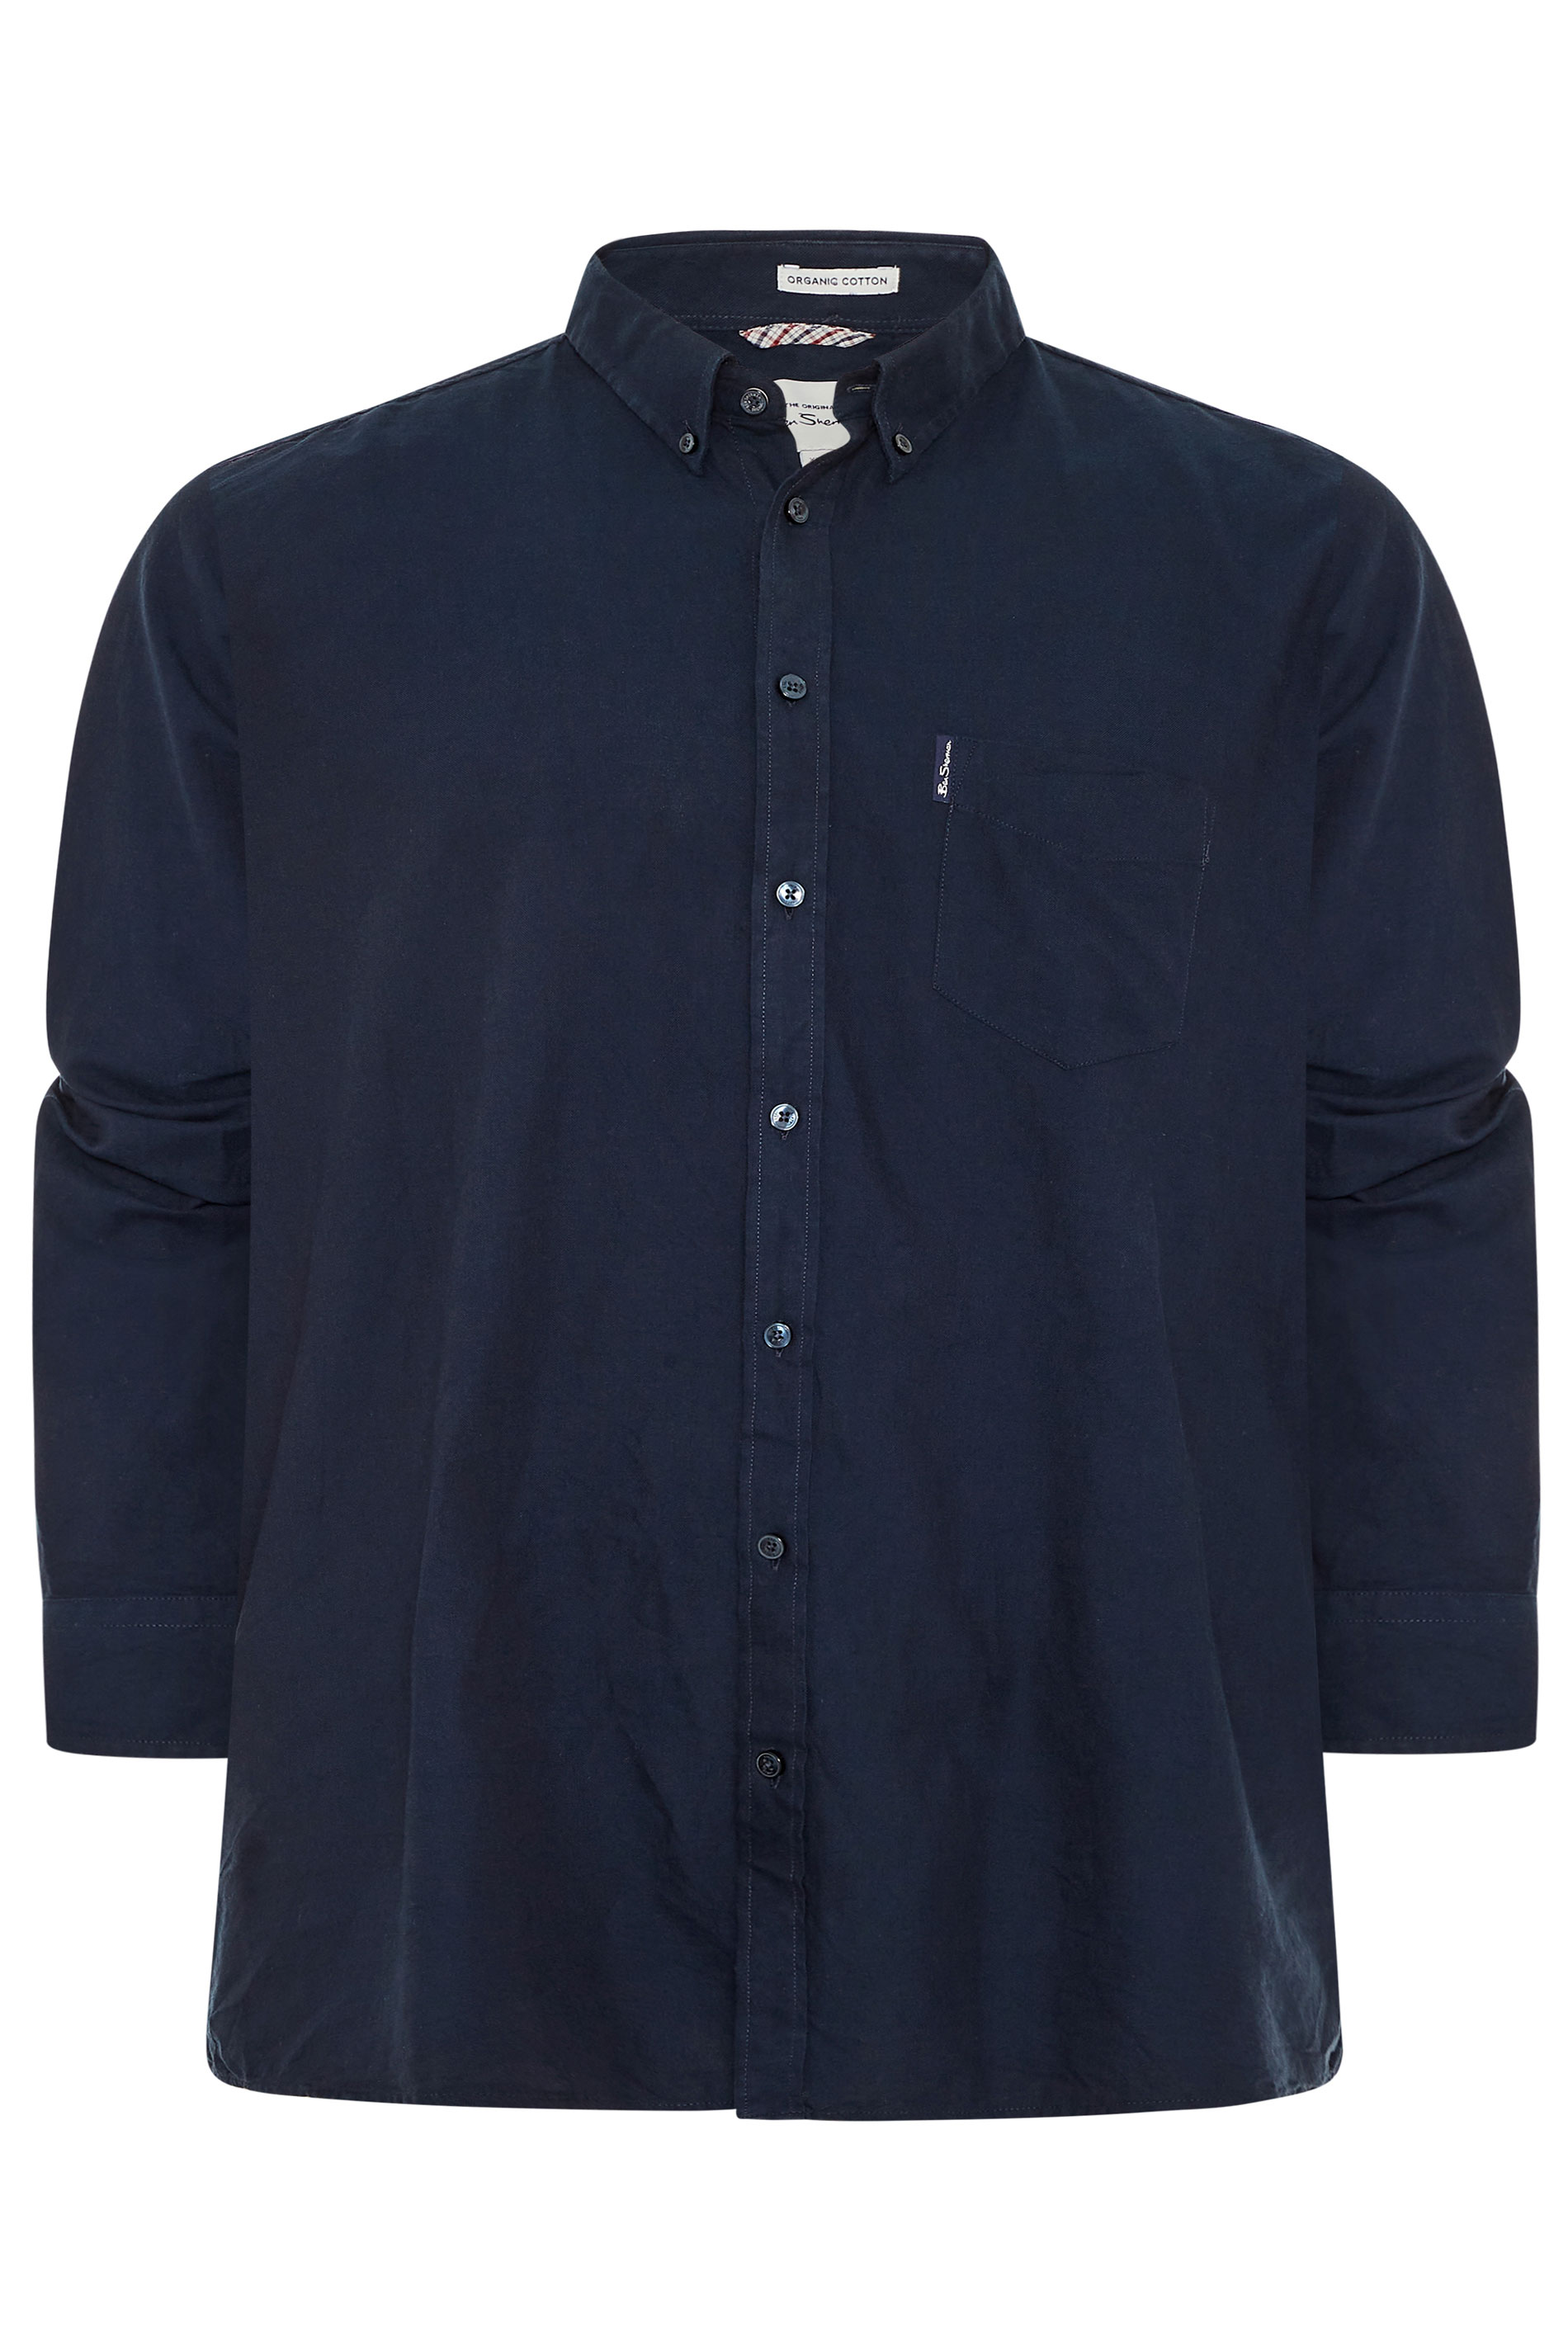 BEN SHERMAN Navy Signature Long Sleeve Oxford Shirt